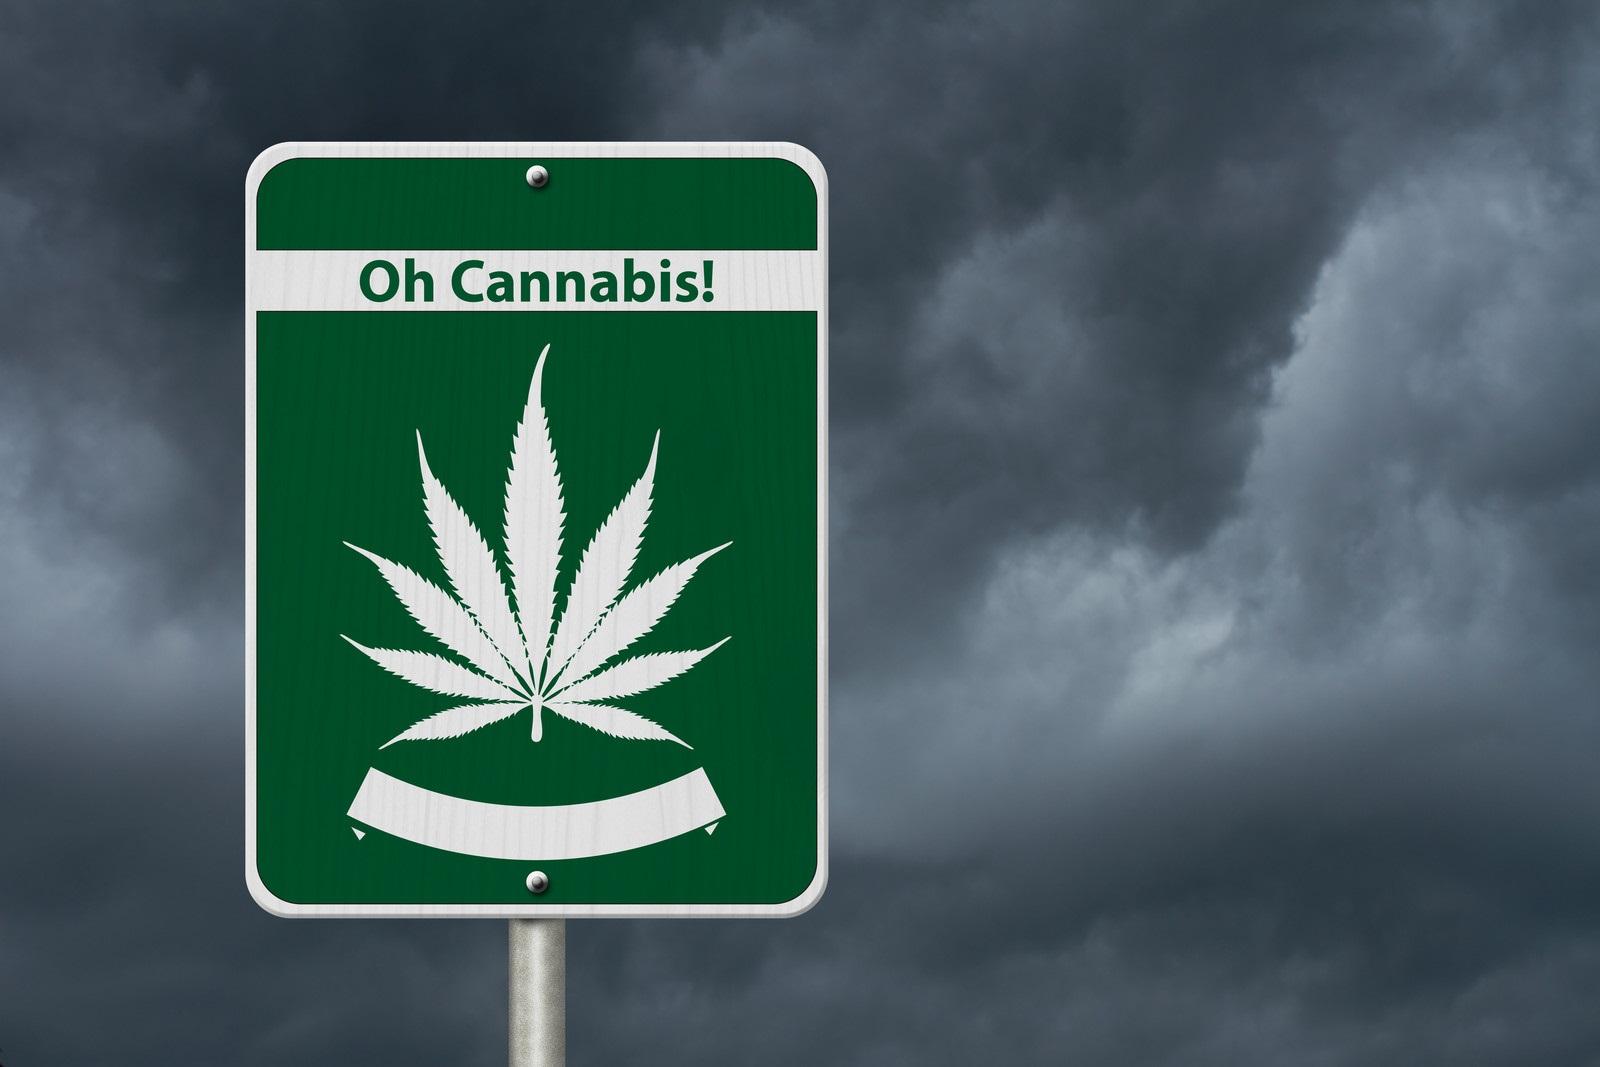 Canada recreational marijuana products